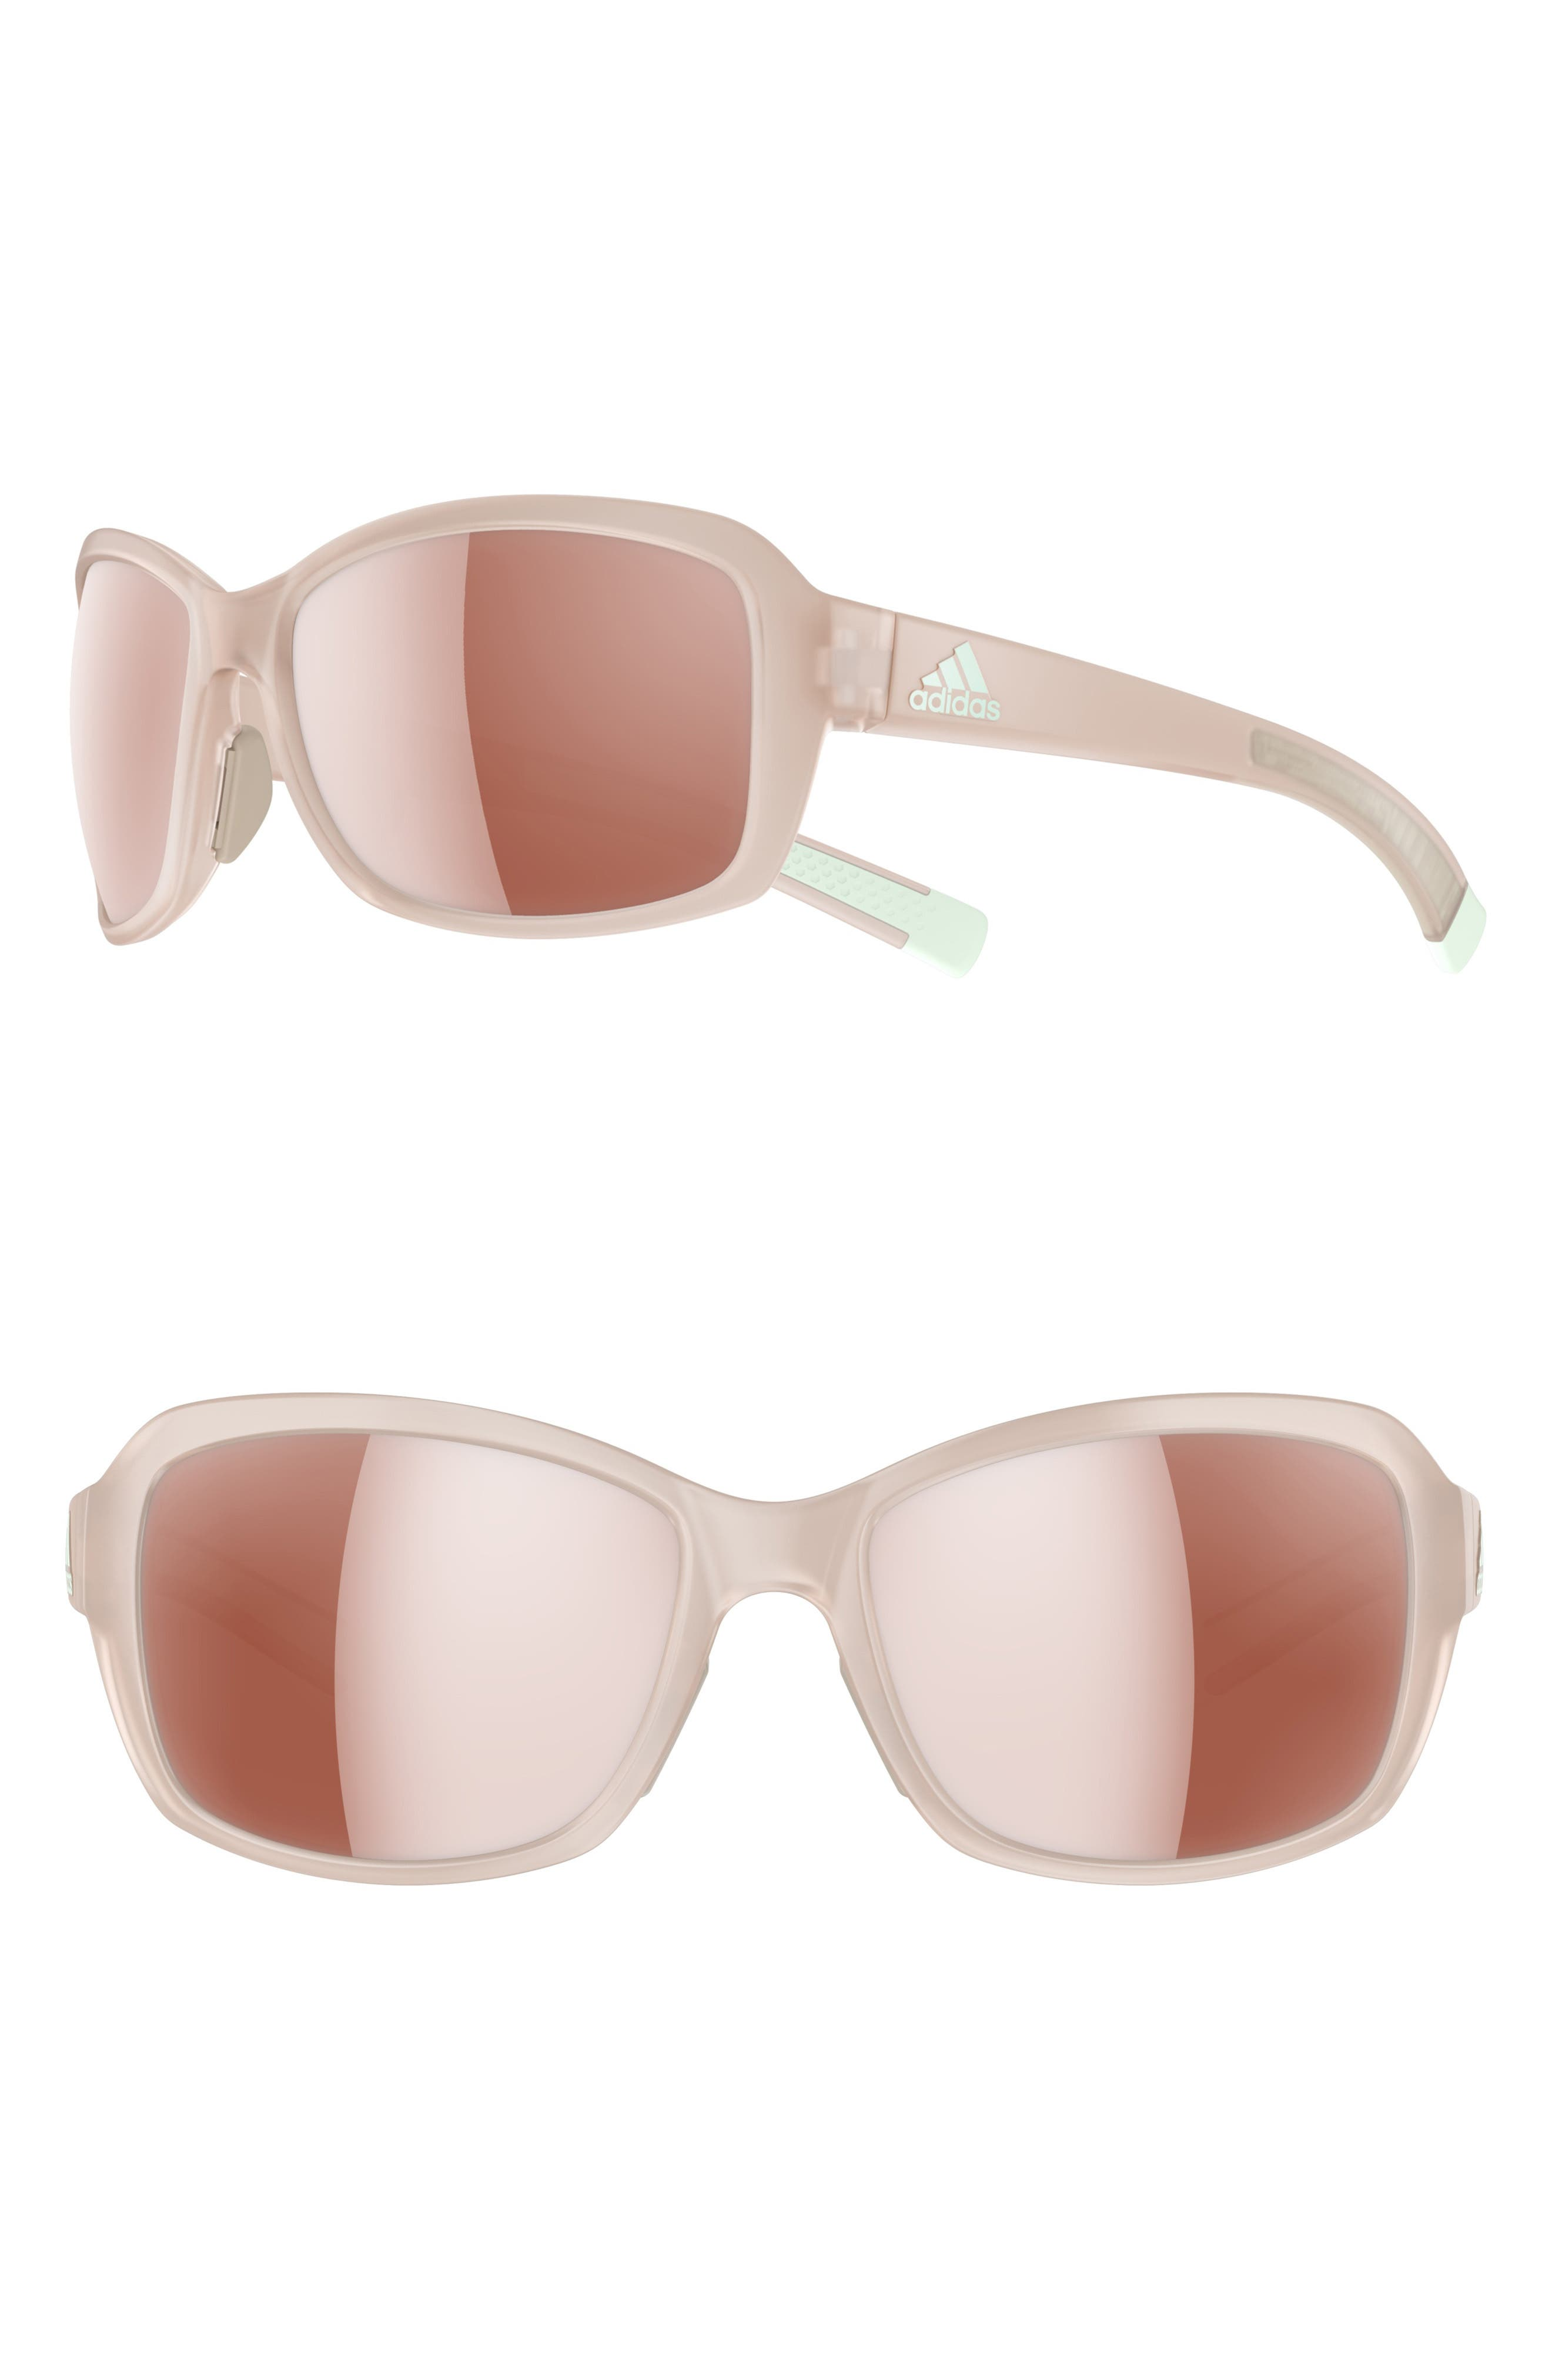 ADIDAS Baboa 55mm Sport Sunglasses, Main, color, MATTE GREY/ ACTIVE SILVER